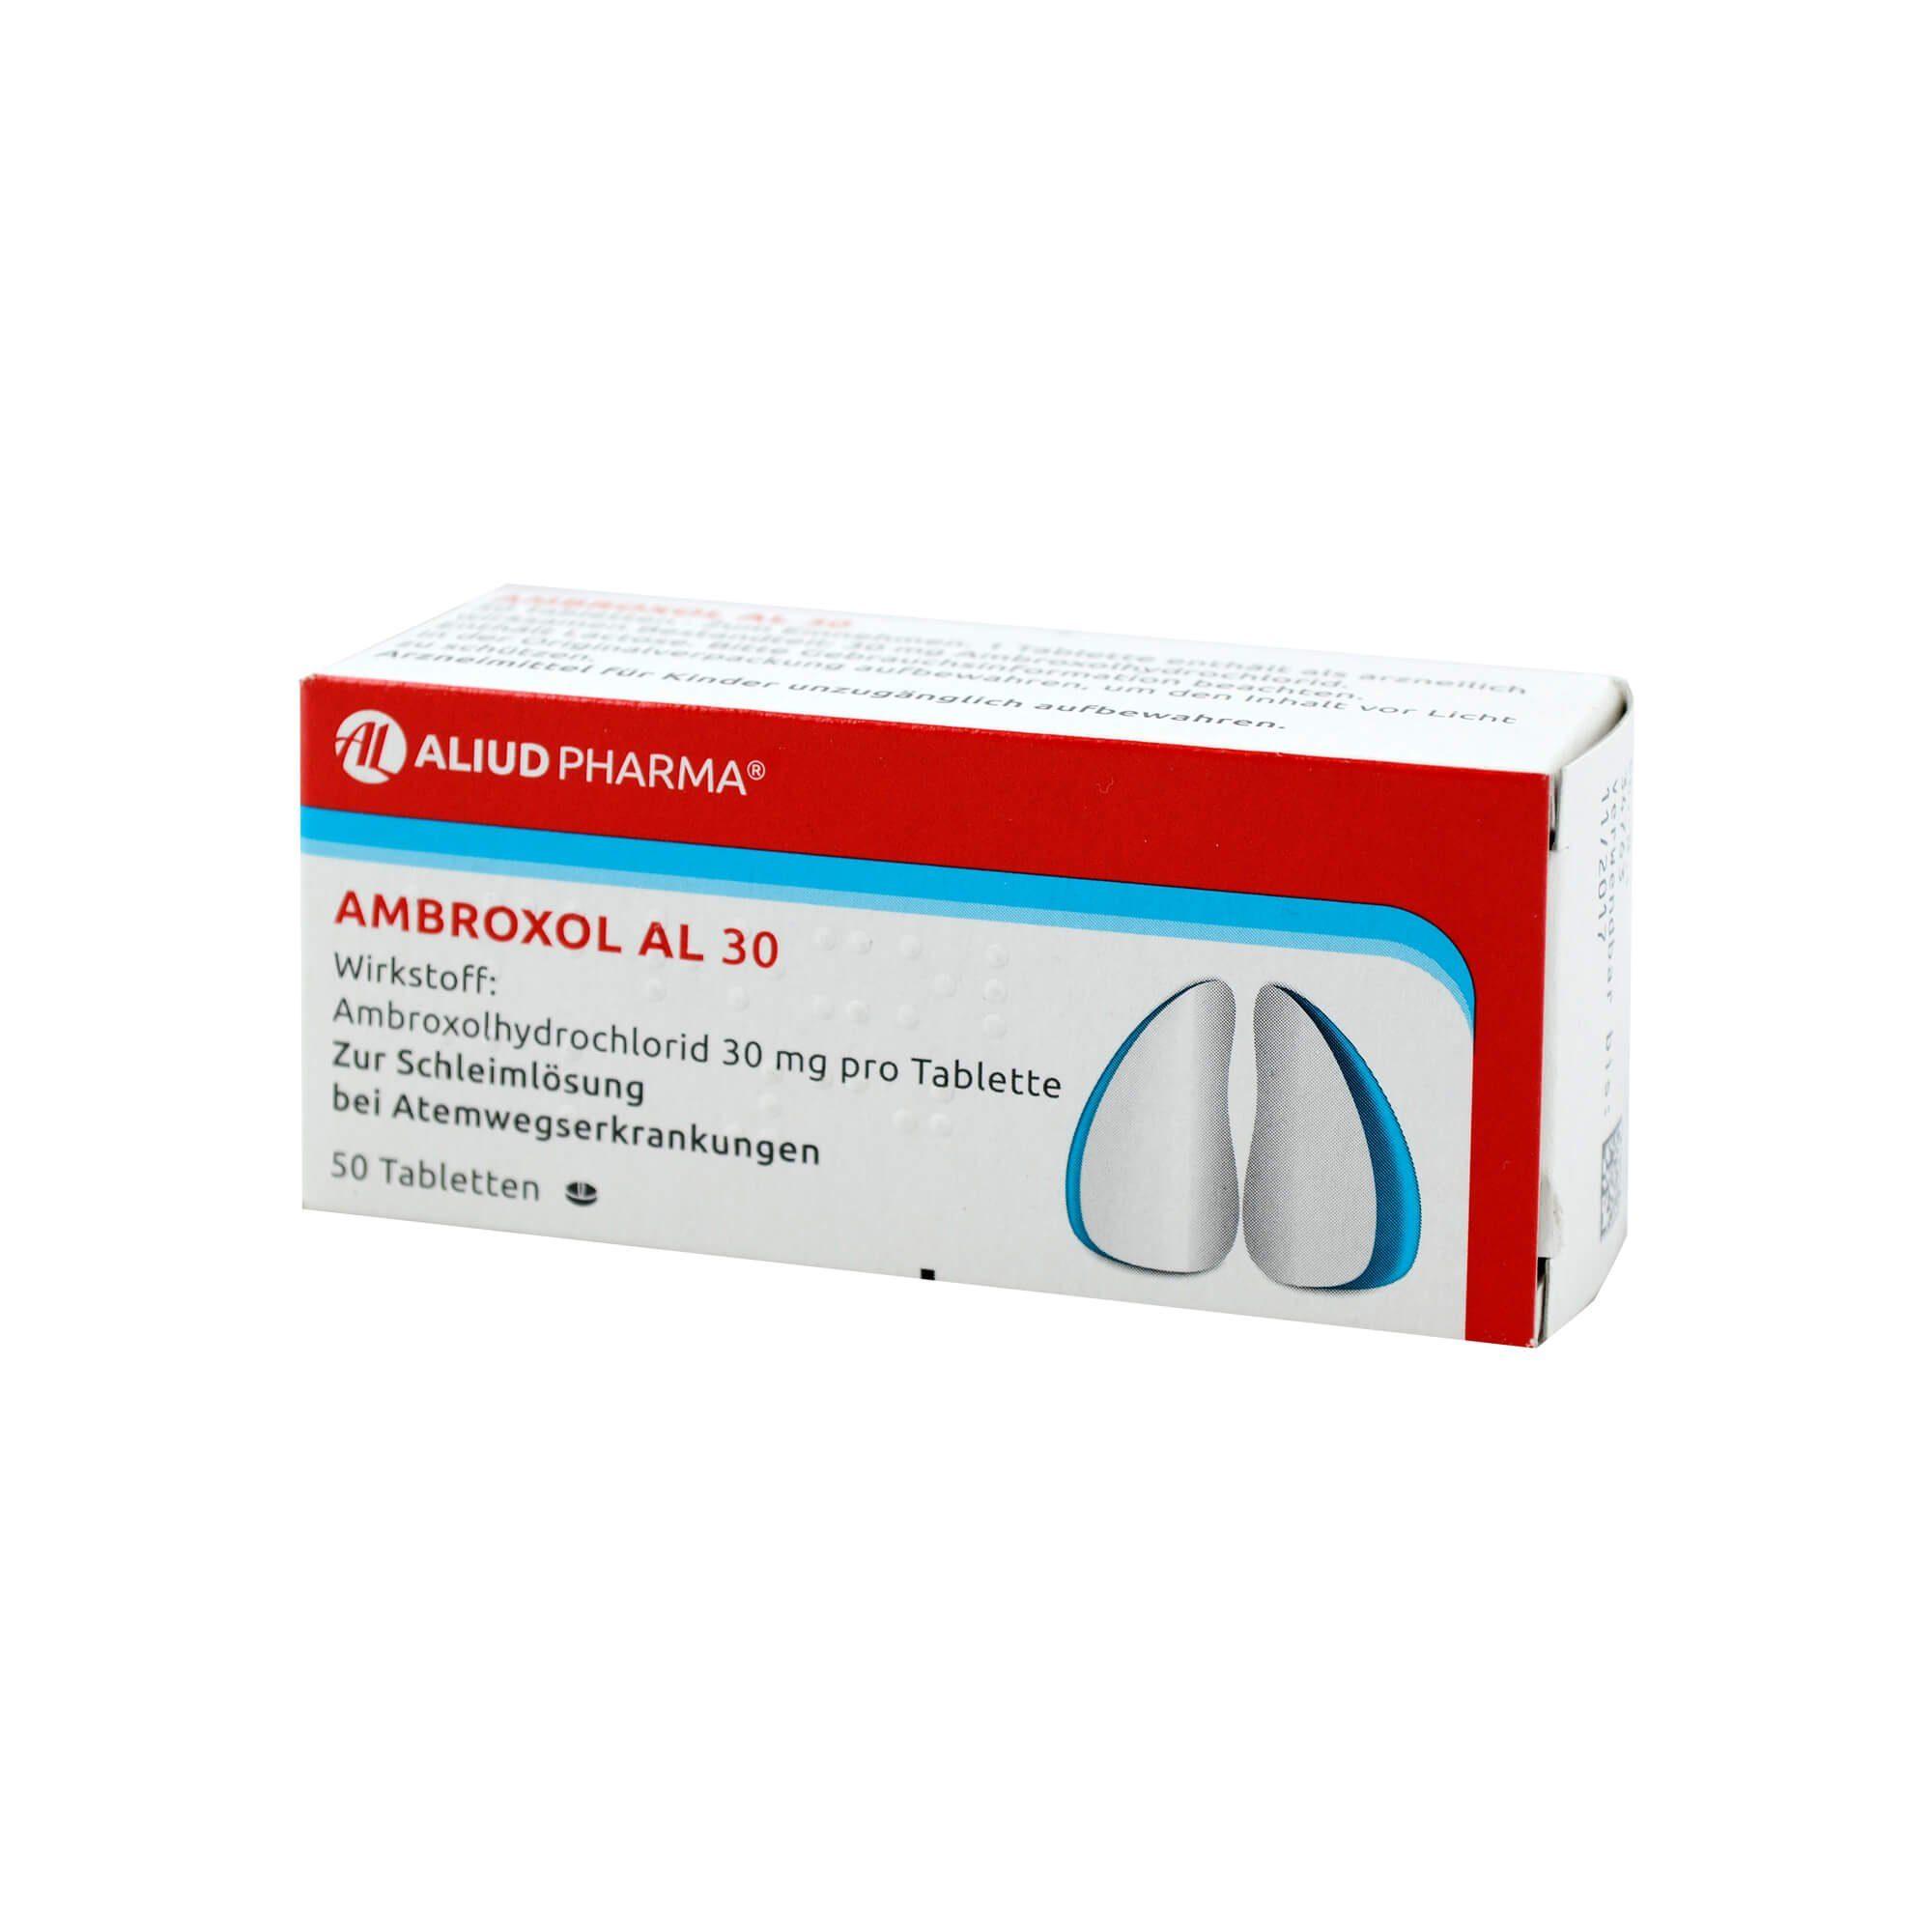 Ambroxol AL 30 Tabletten , 50 St